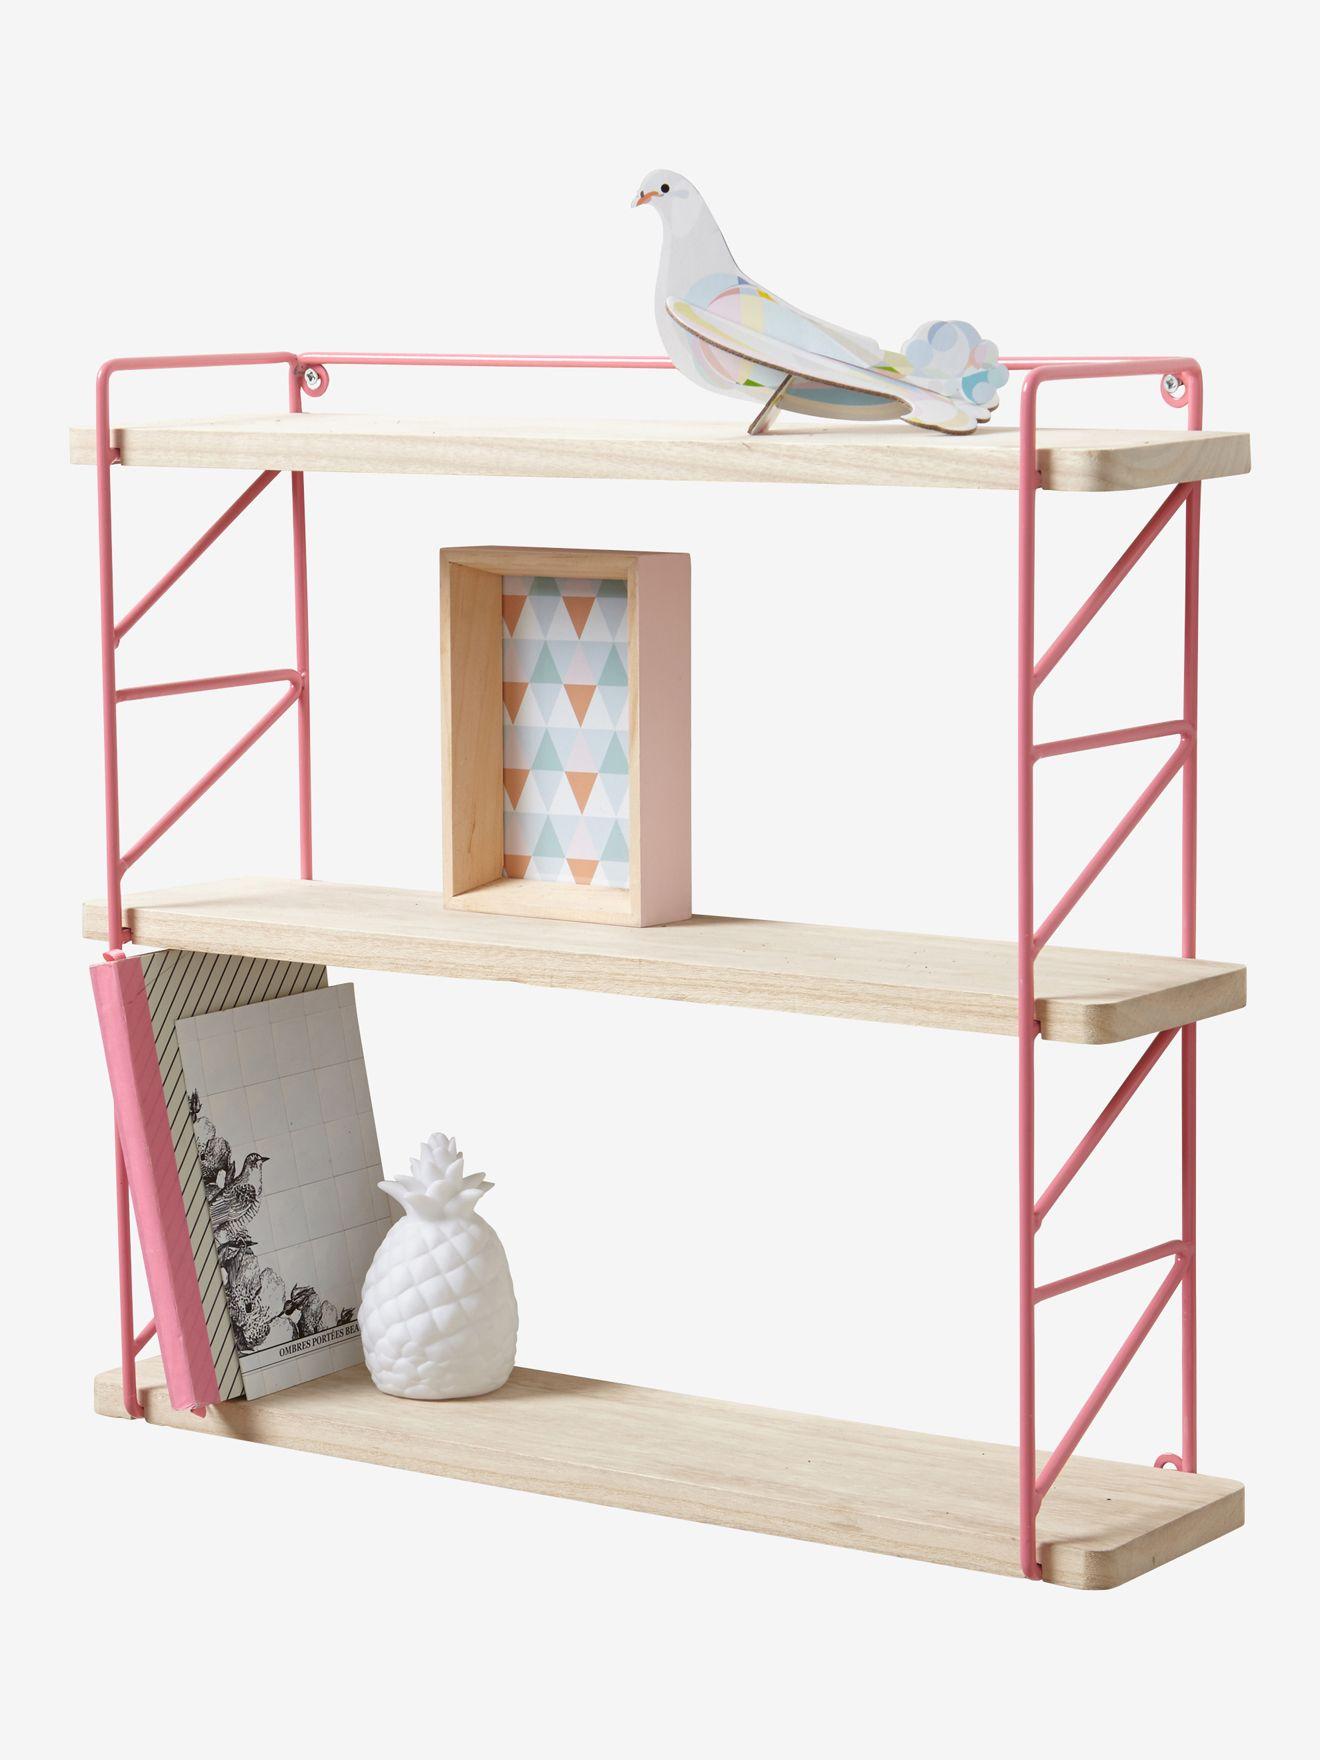 Vertbaudet Wandregal Fur Kinderzimmer In Multicolor Mittelrose